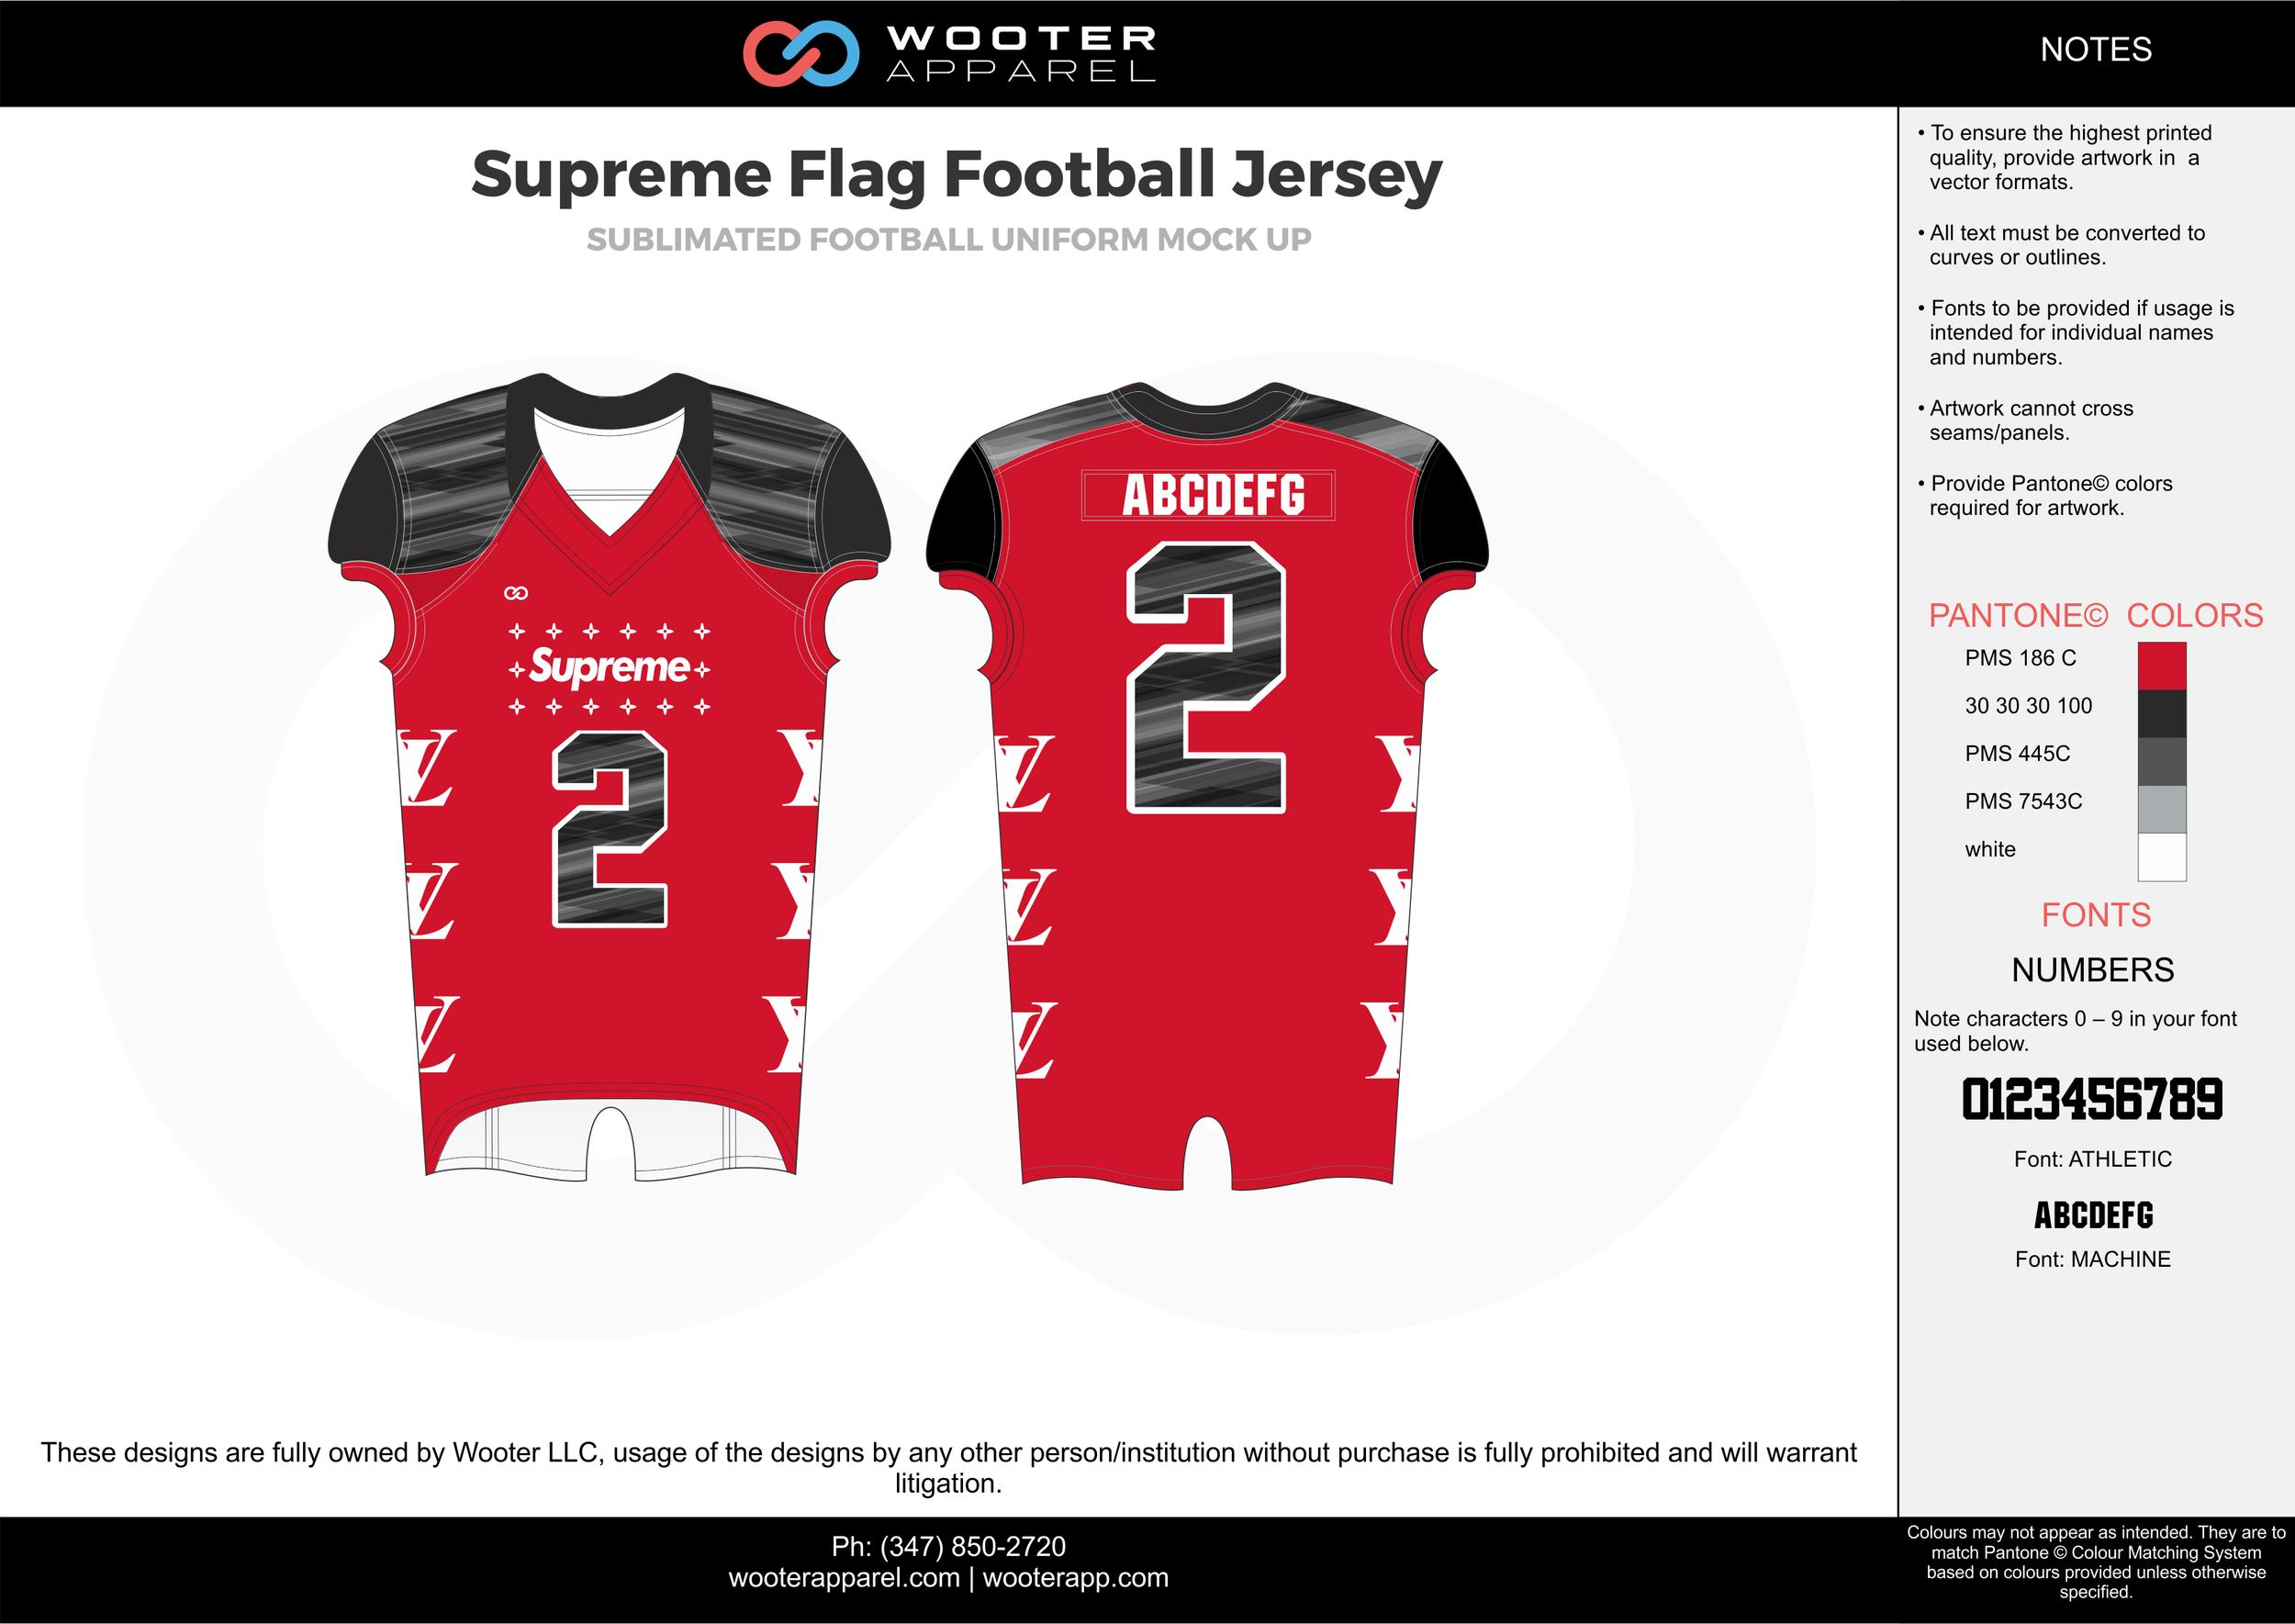 Supreme Flag Football Jersey red black white flag football uniforms jerseys top